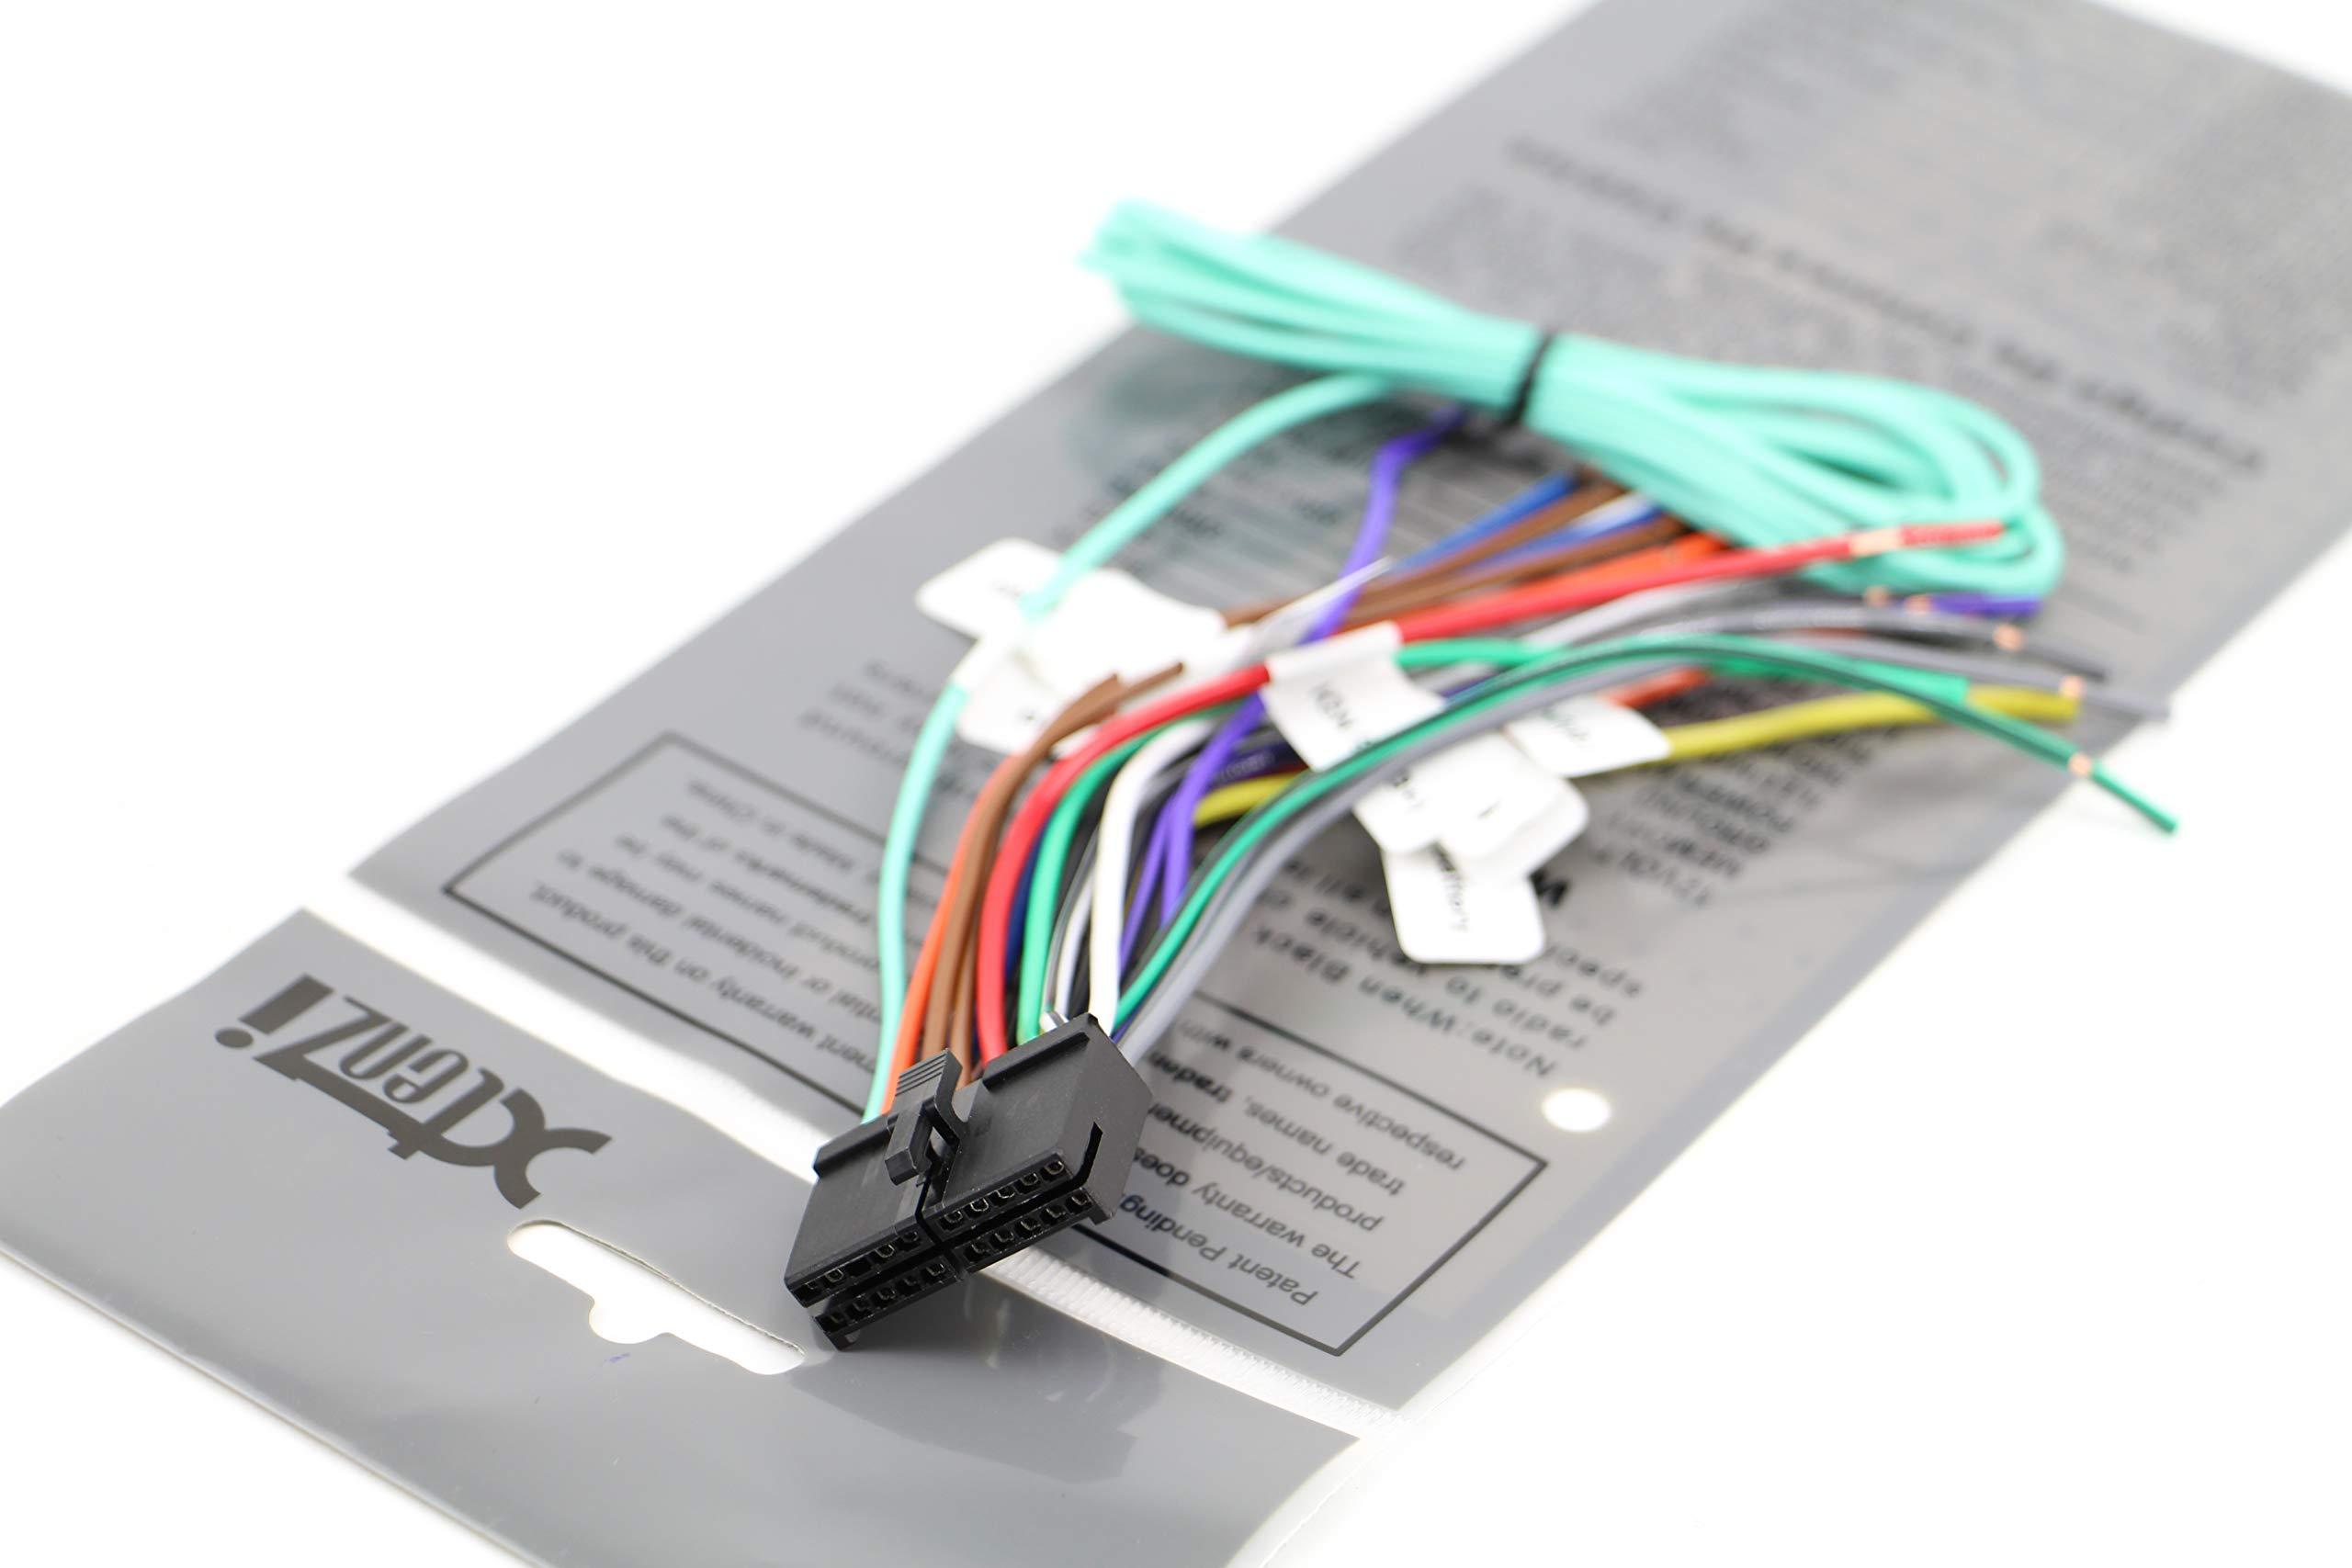 Xtenzi 20Pin Radio Wire Harness for Dual XDVD236BT,XDVD1265BT,XDVD1262,XDVD256BT